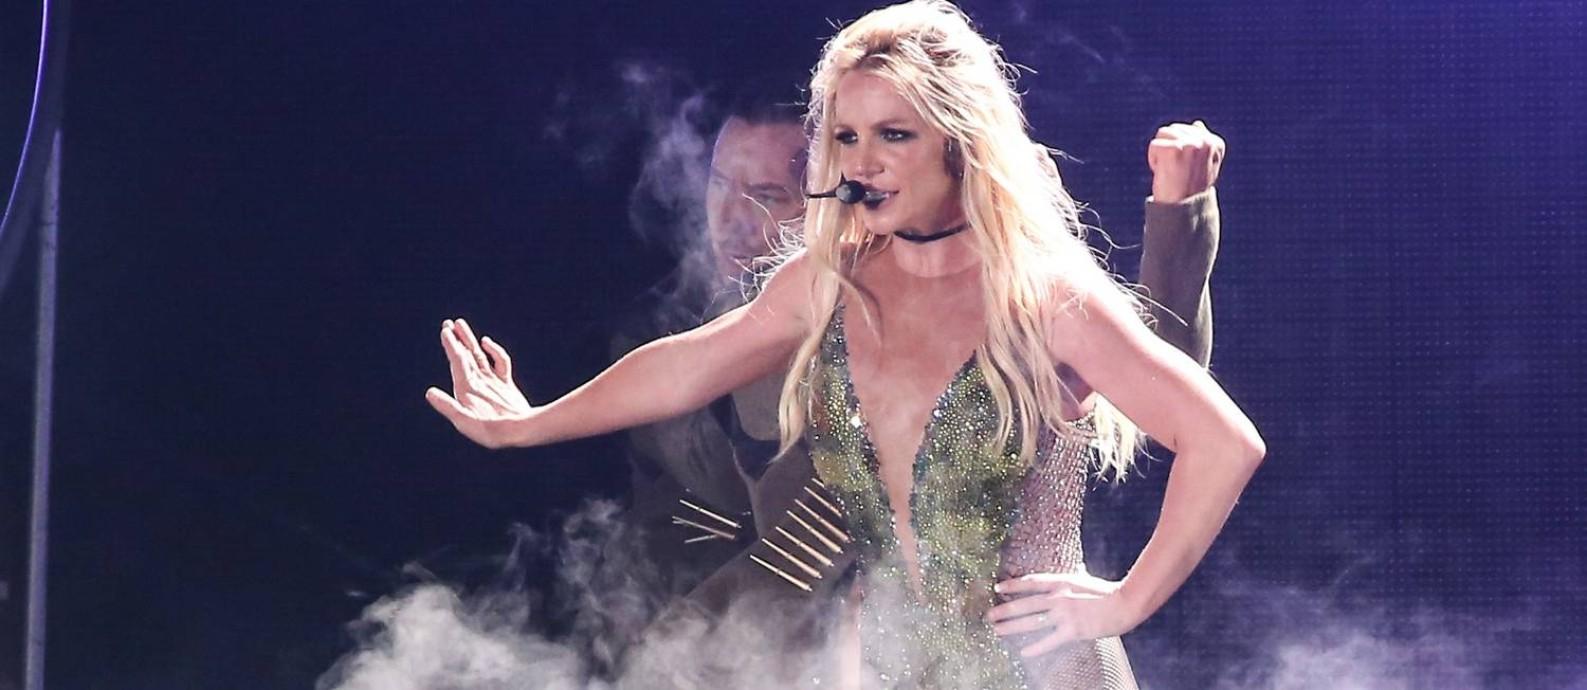 A cantora Britney Spears durante o show 'Piece of me' Foto: Mirrormedia